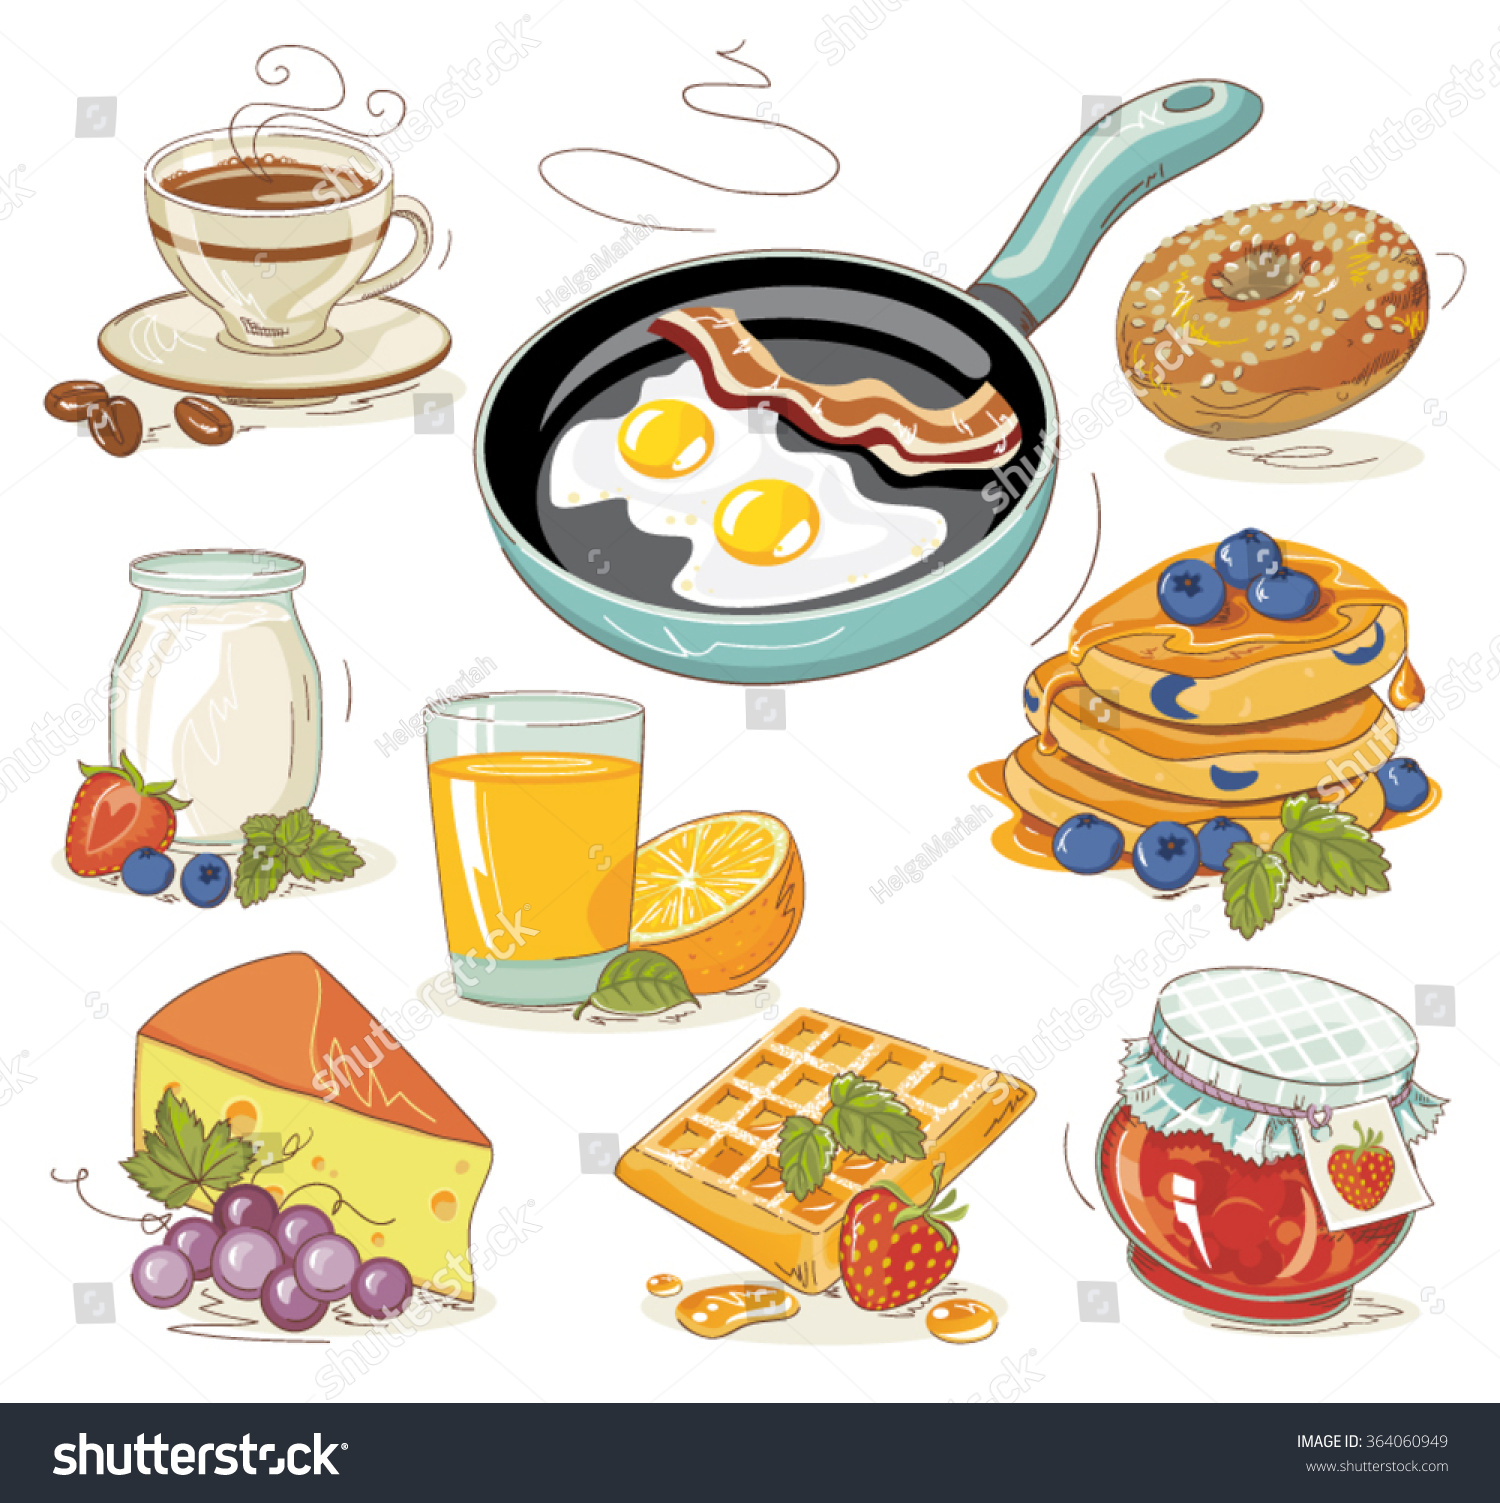 breakfast menu clipart - photo #27